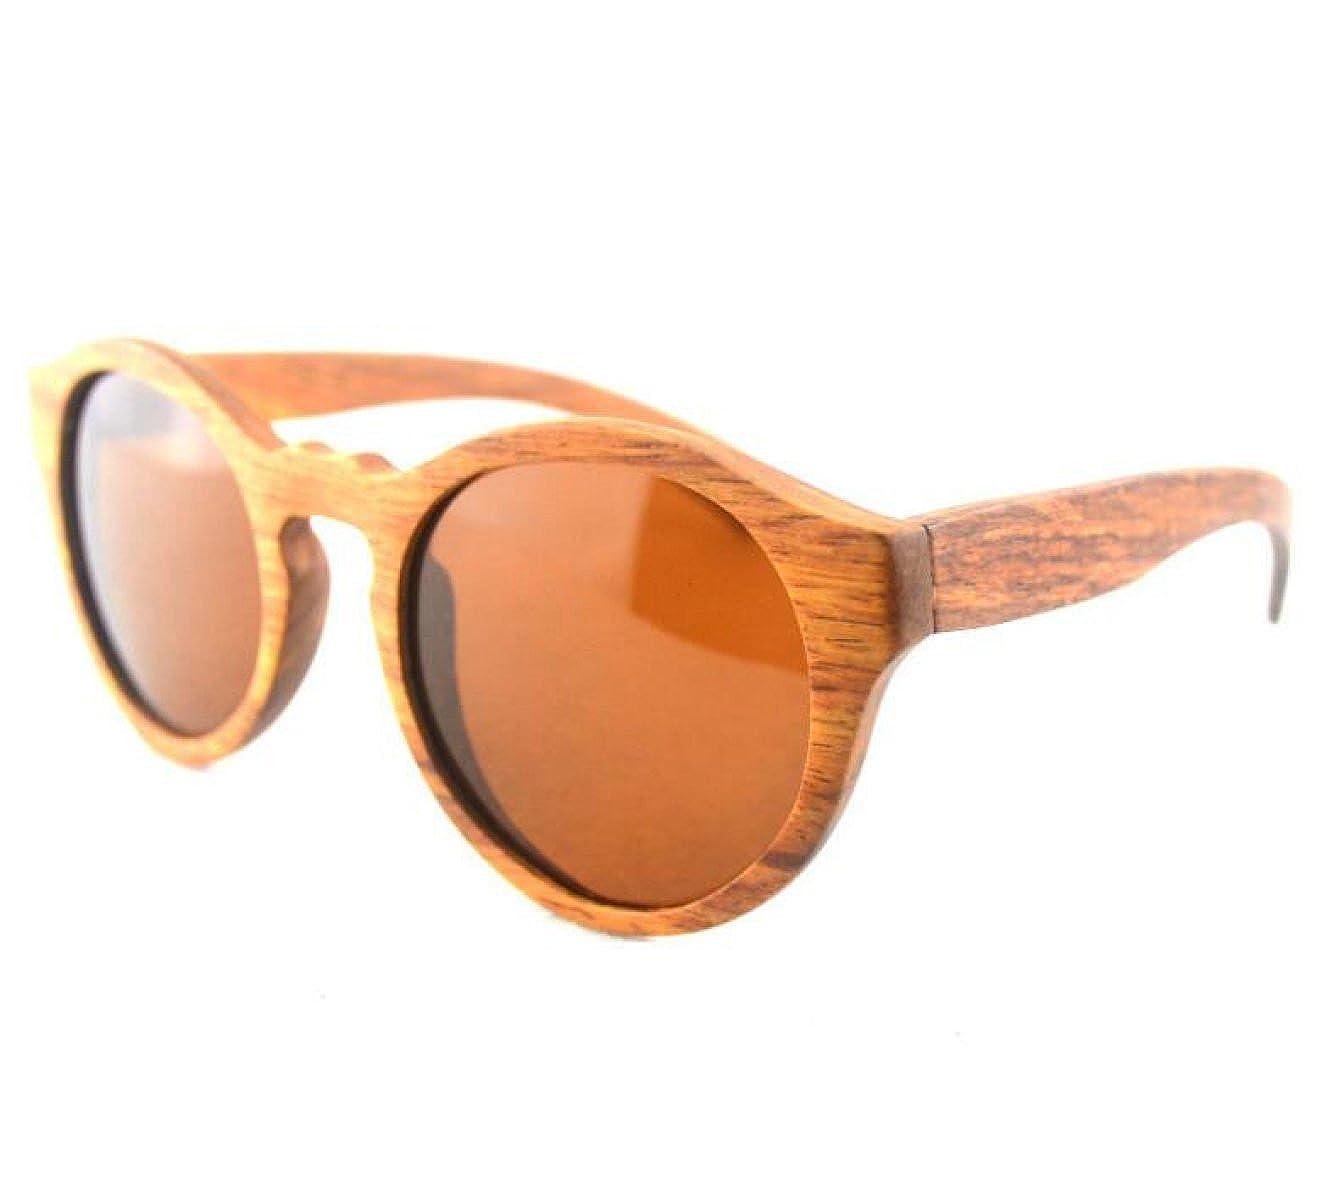 Madera Gato Gafas De Sol Polarizadas, RosewoodTea-L: Amazon ...